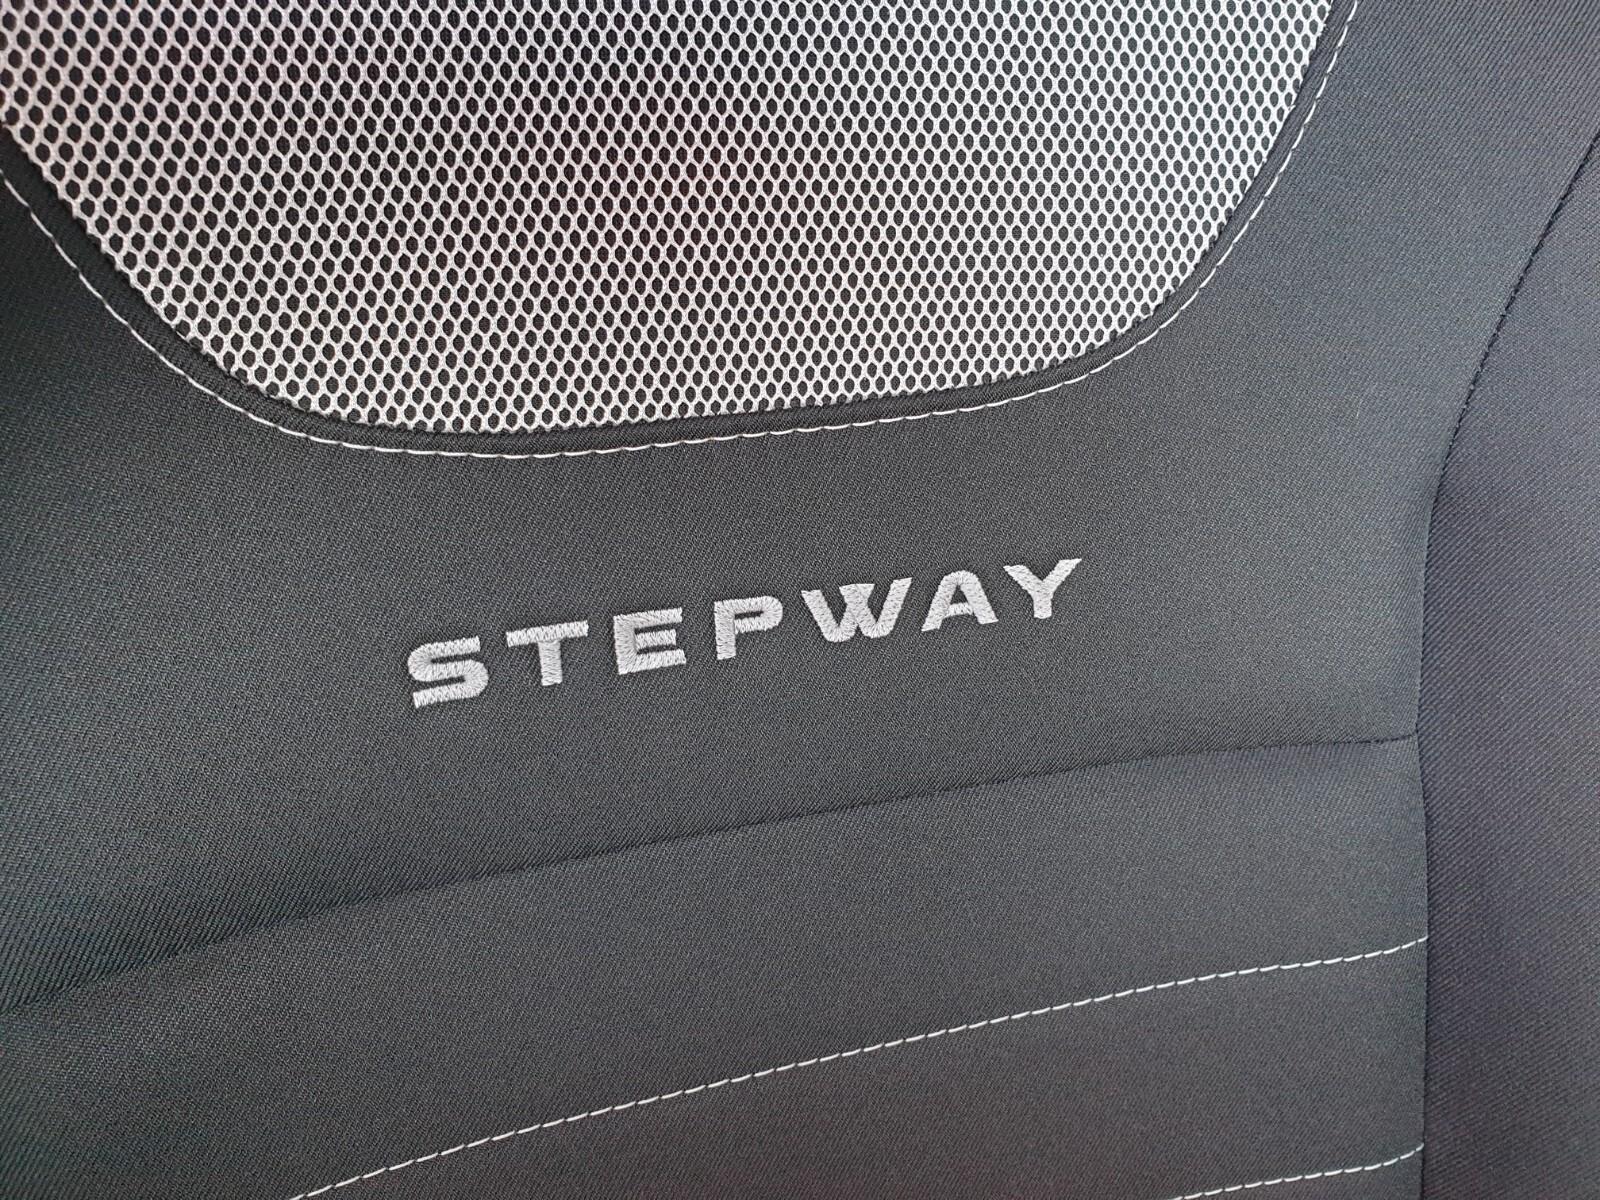 RENAULT 900T STEPWAY EXPRESSION Johannesburg 18307495